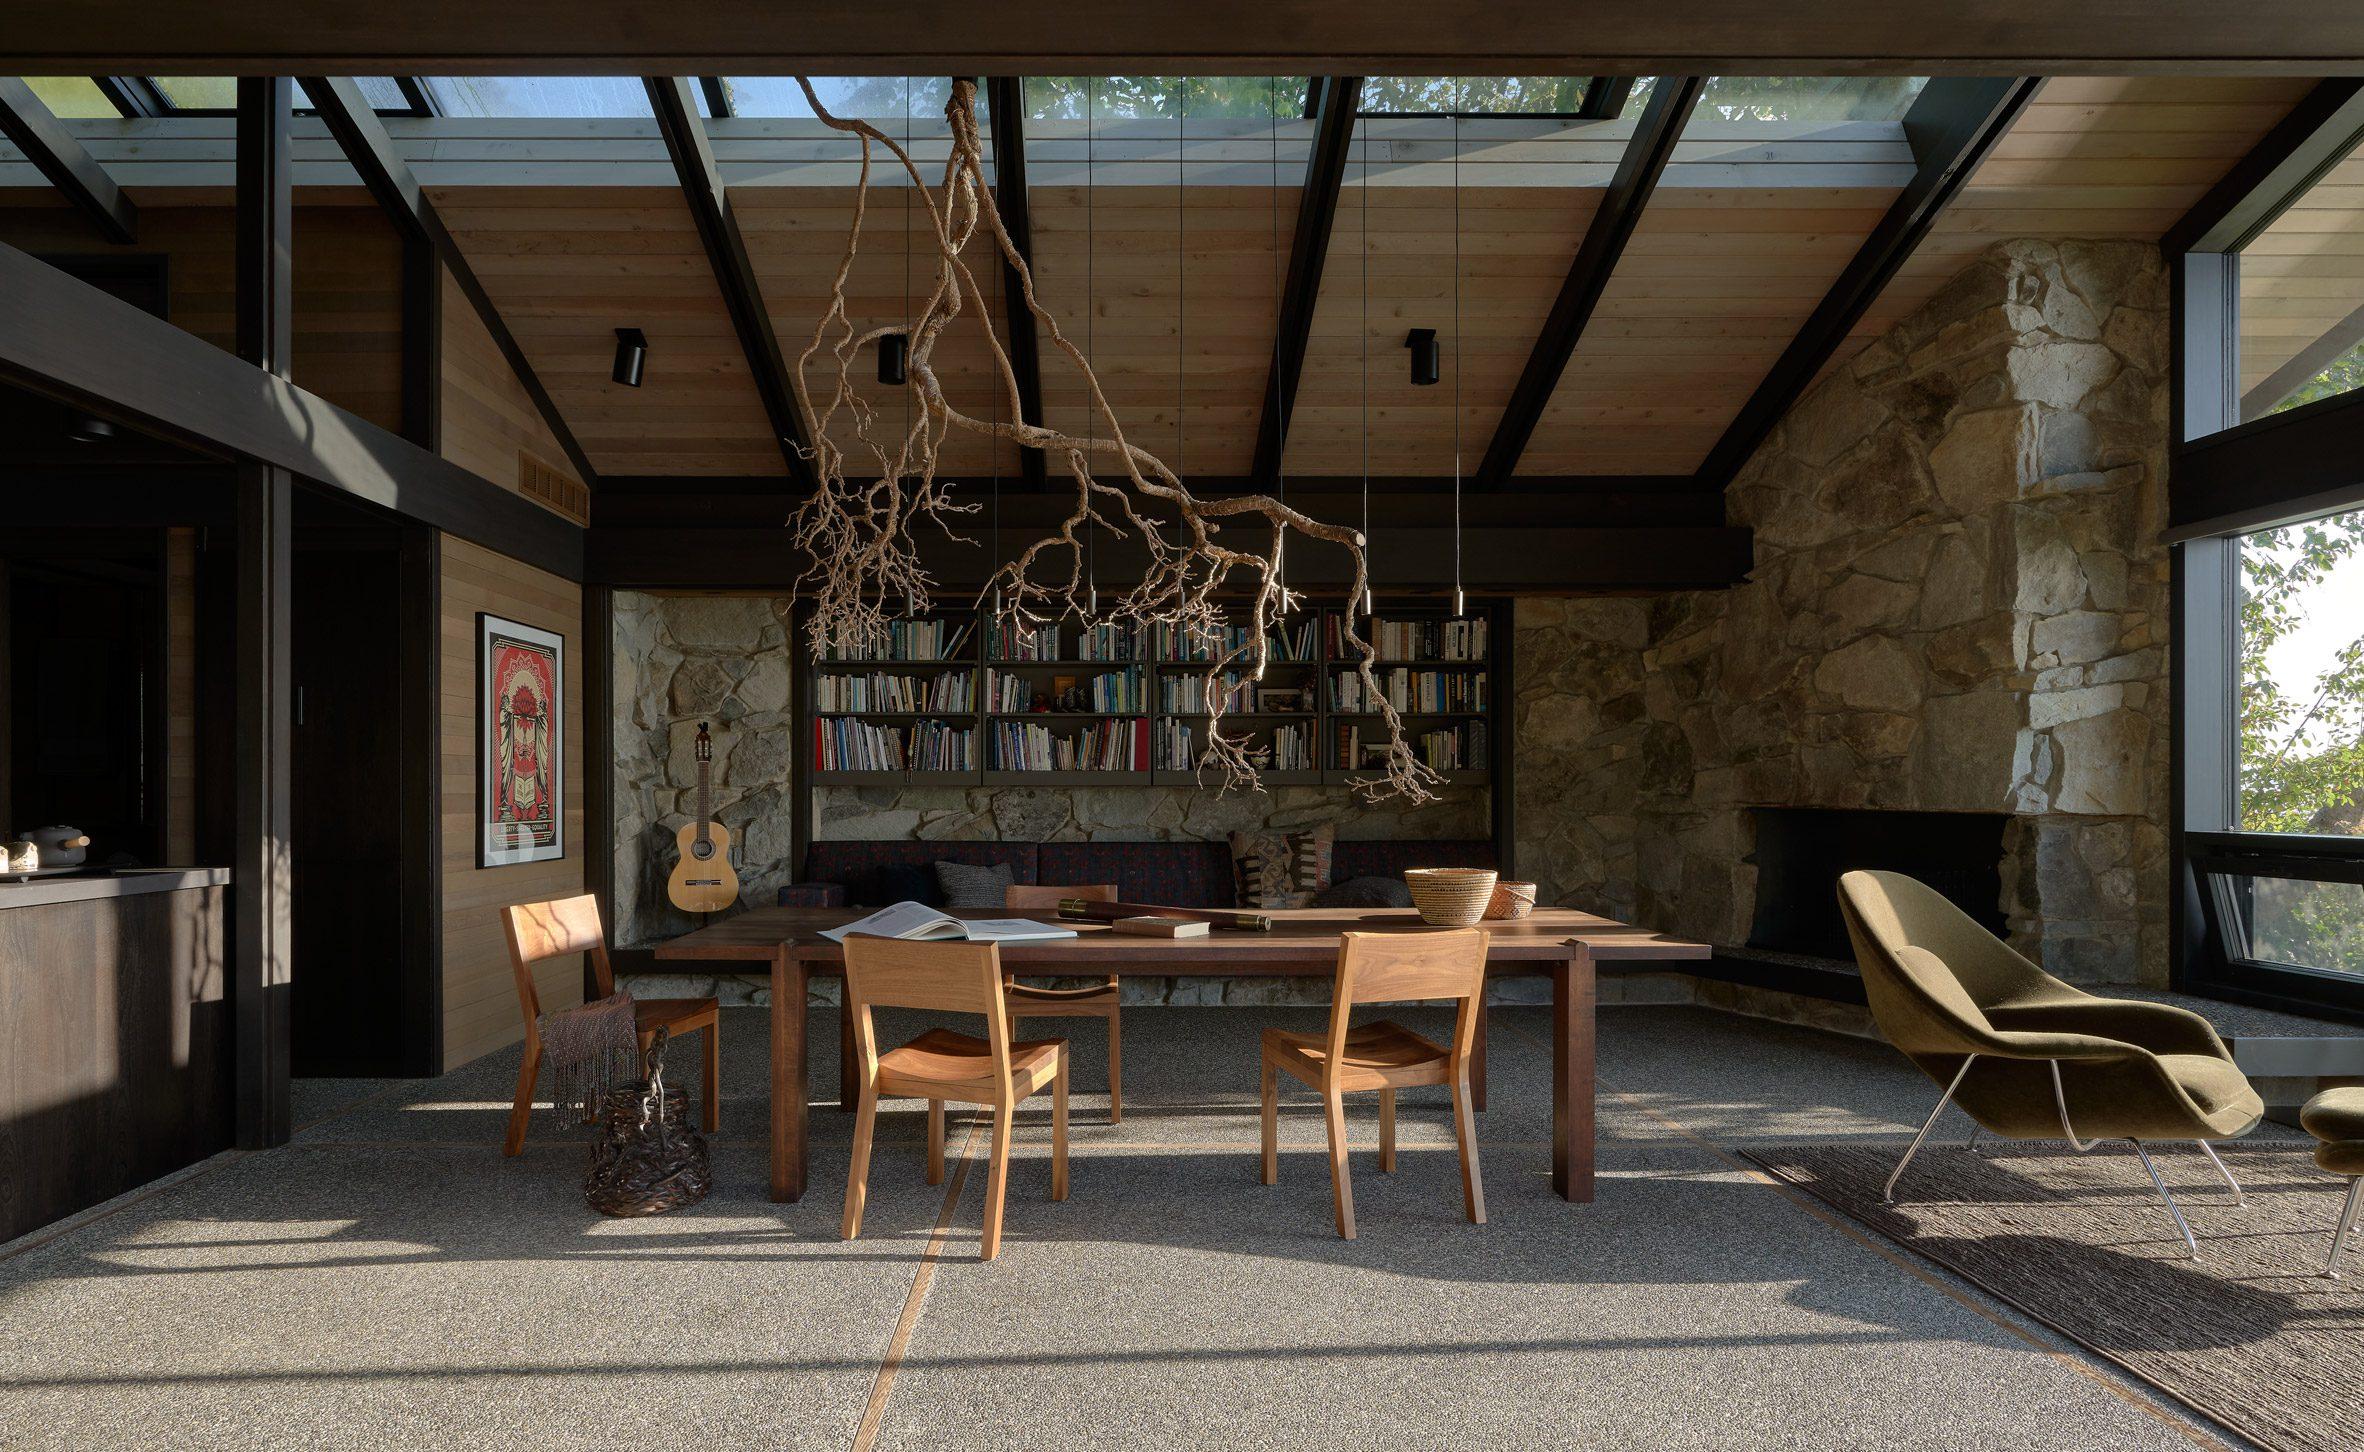 The studio updated Loom House's interiors